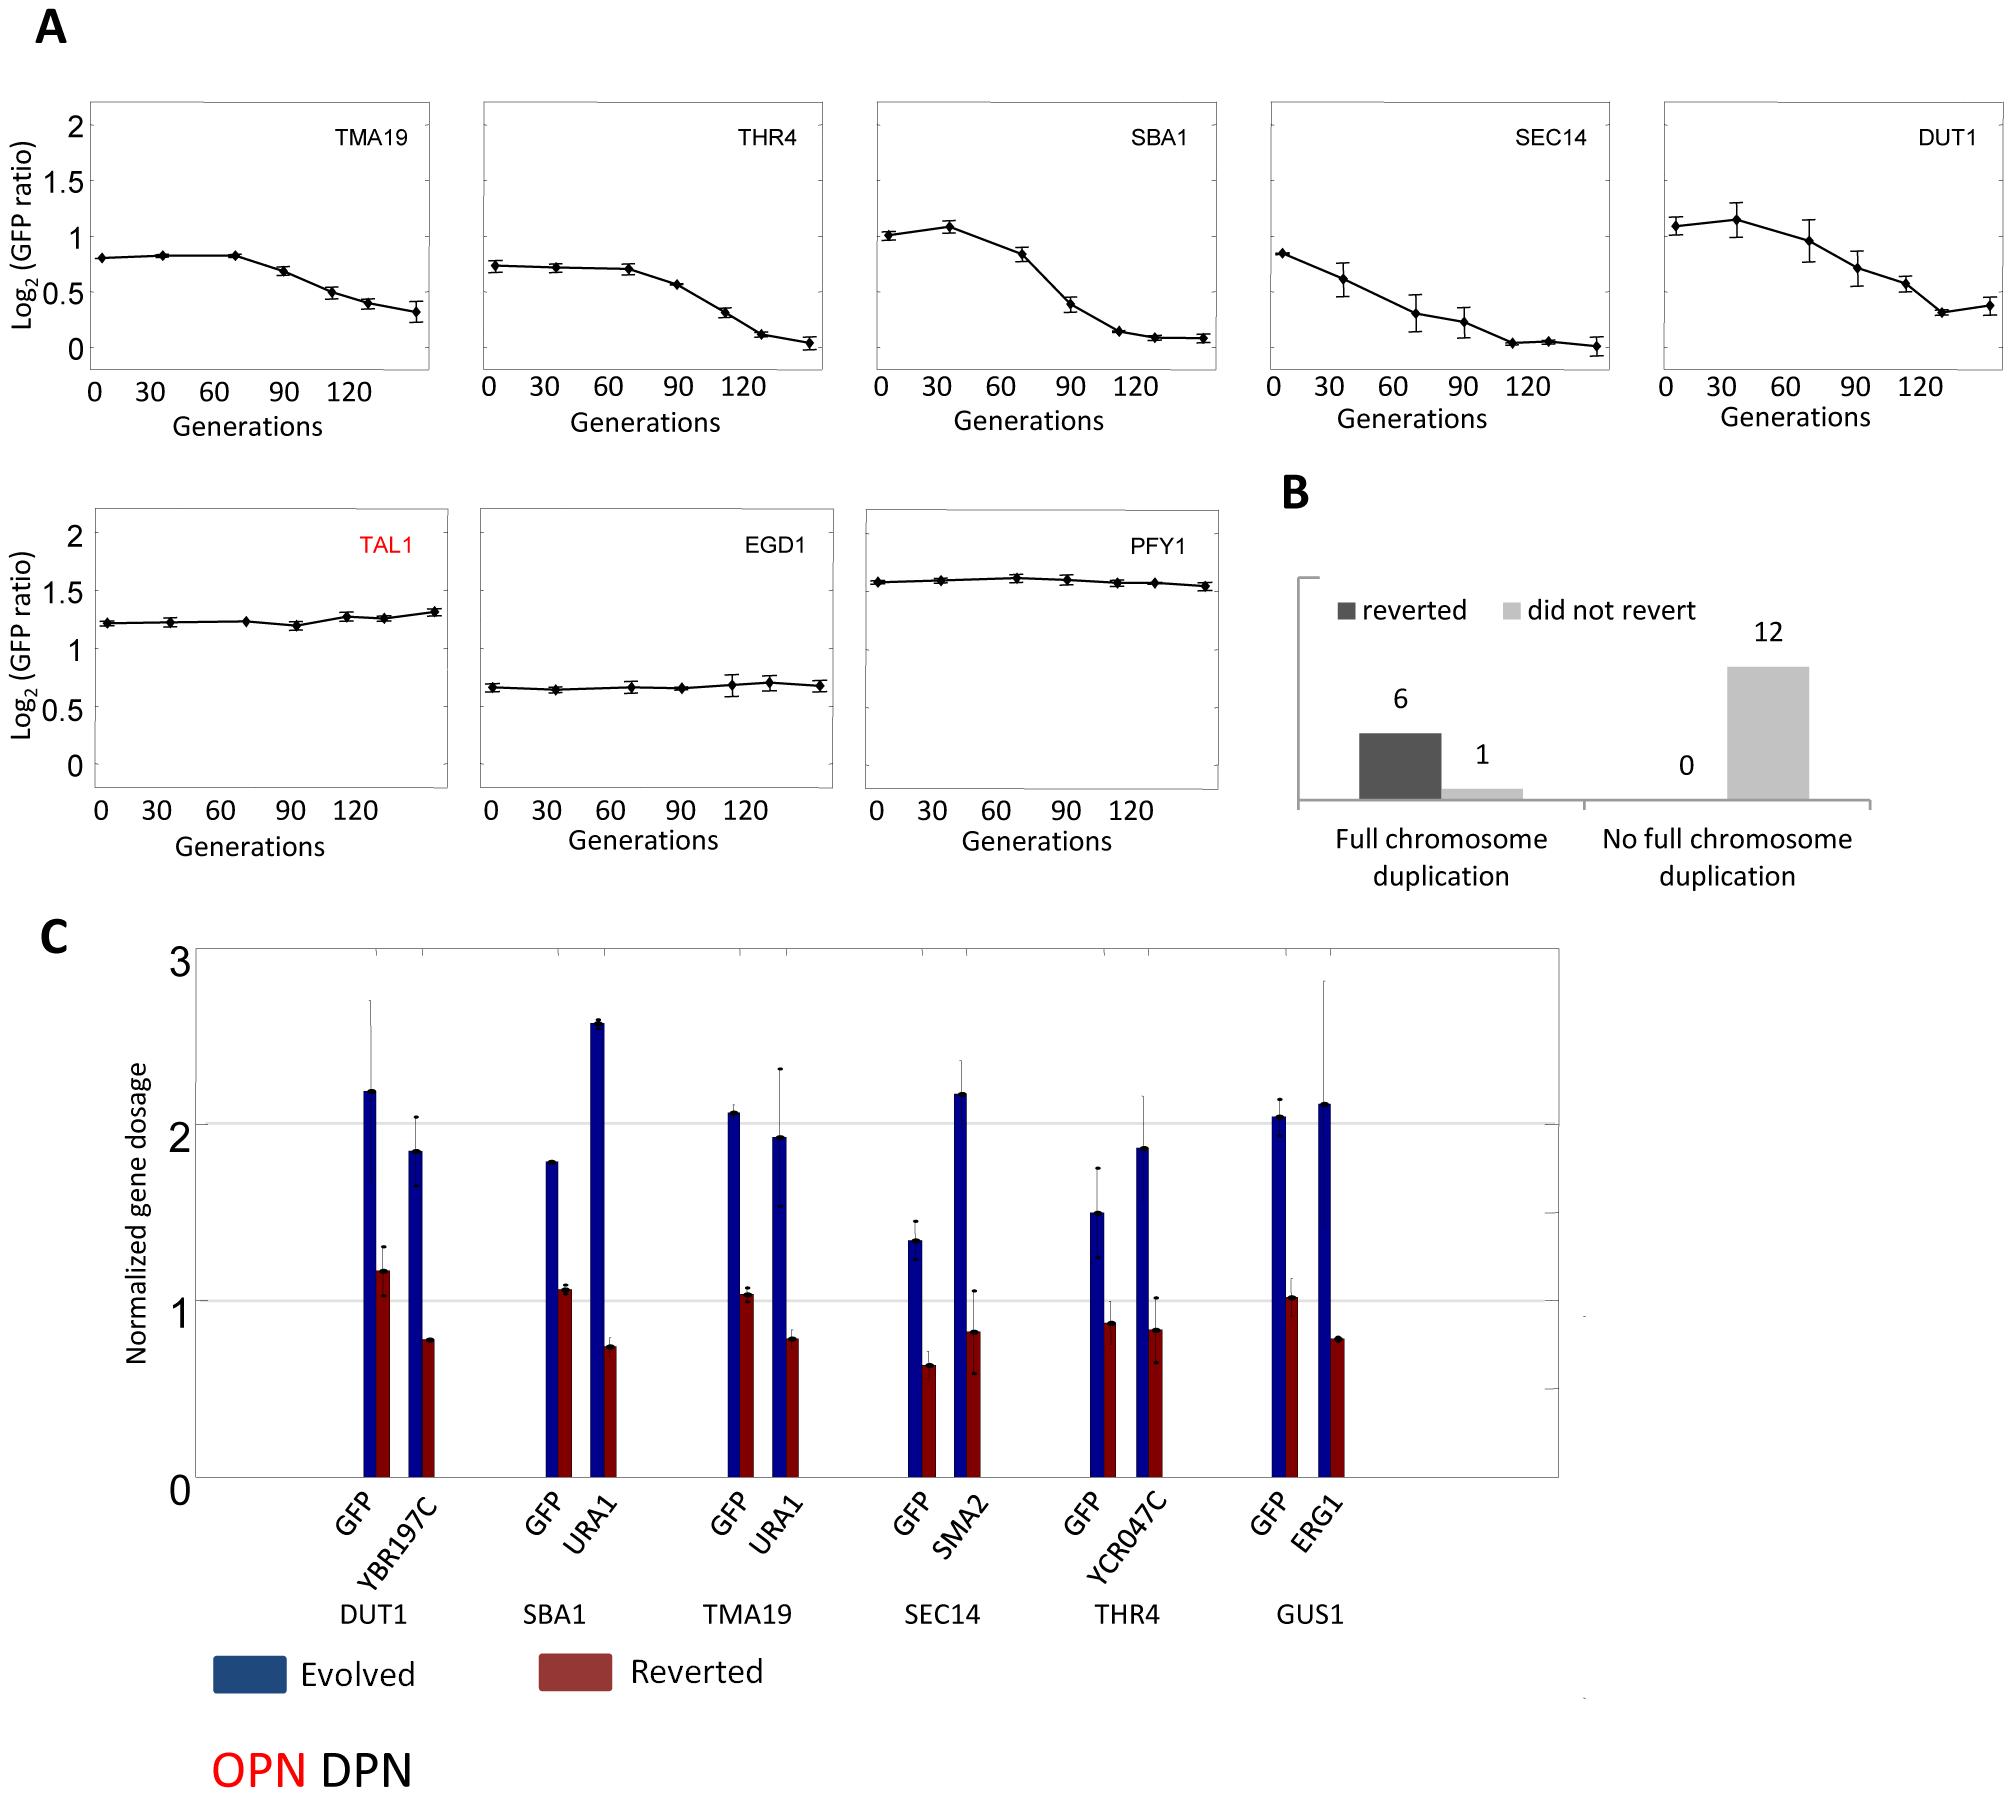 Reversion of evolution by chromosome duplication.